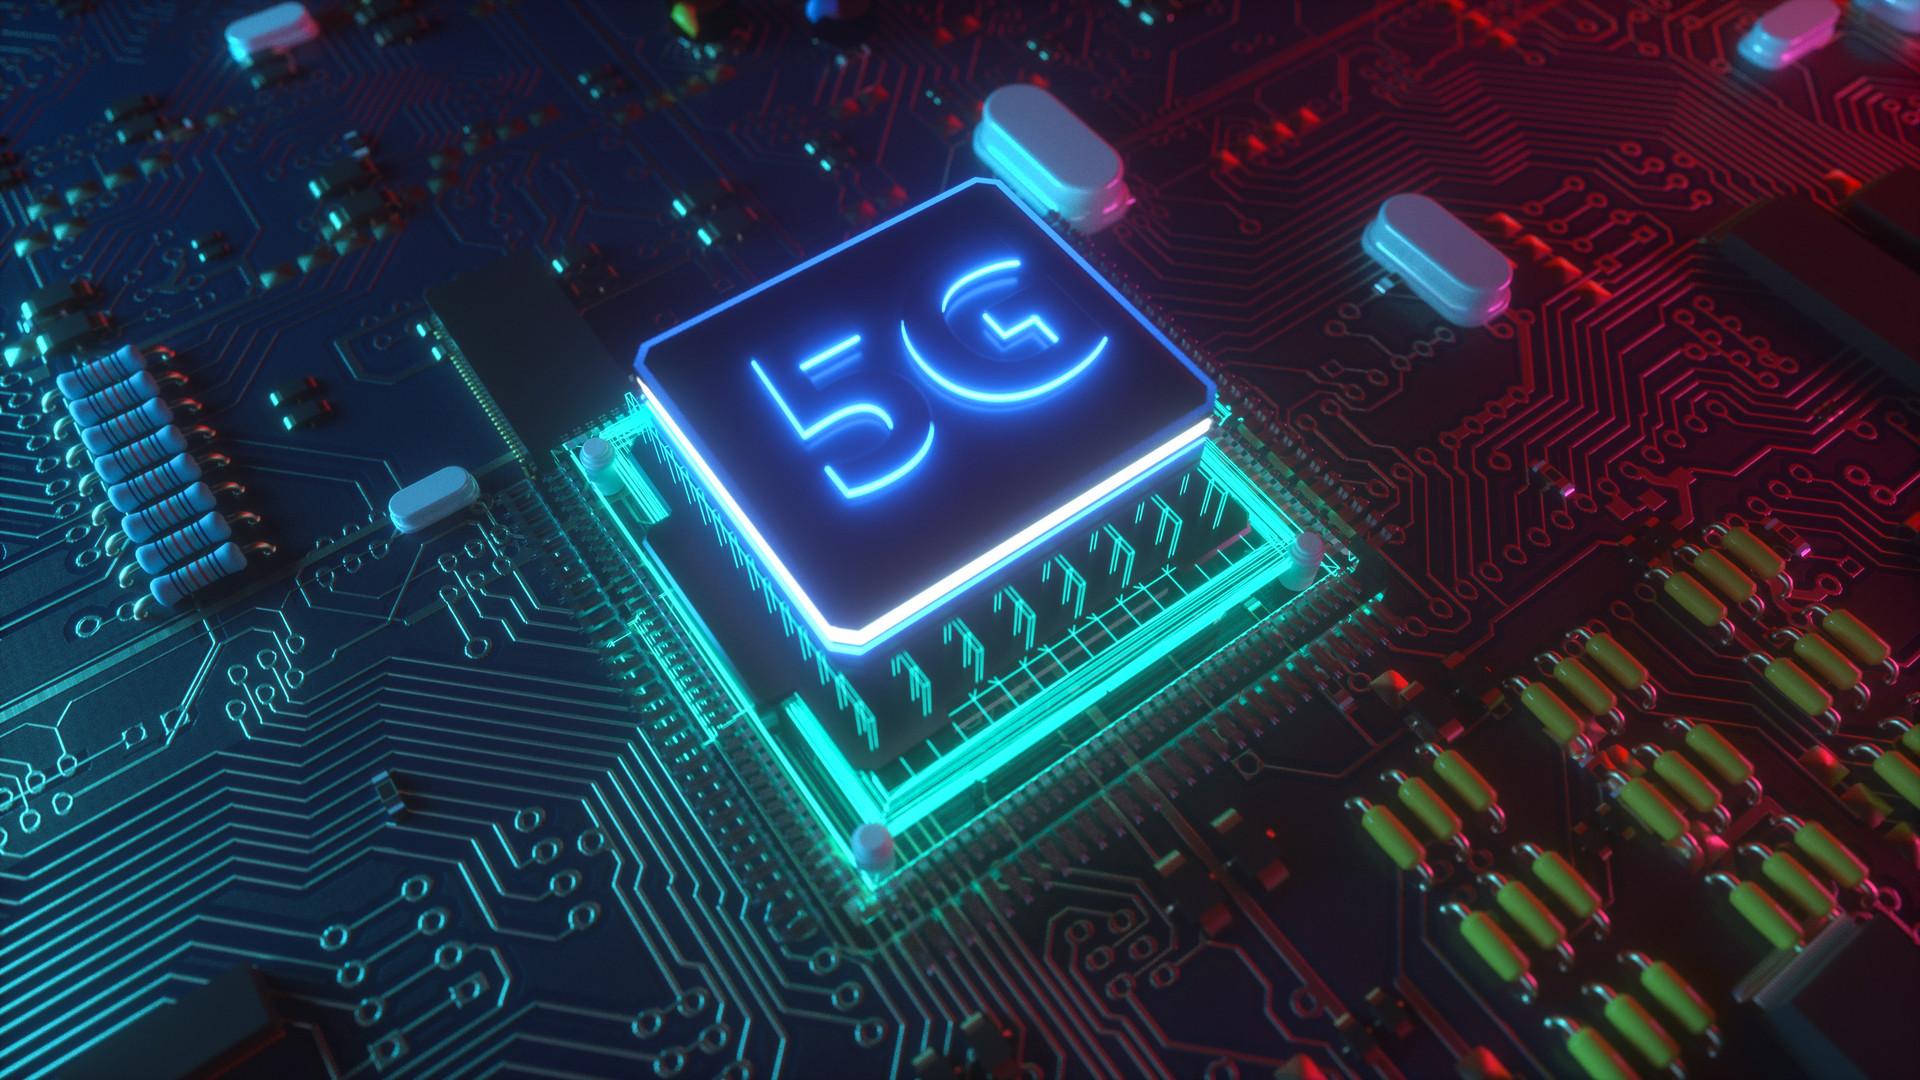 5G五问:创新改变瓶颈优势潜力